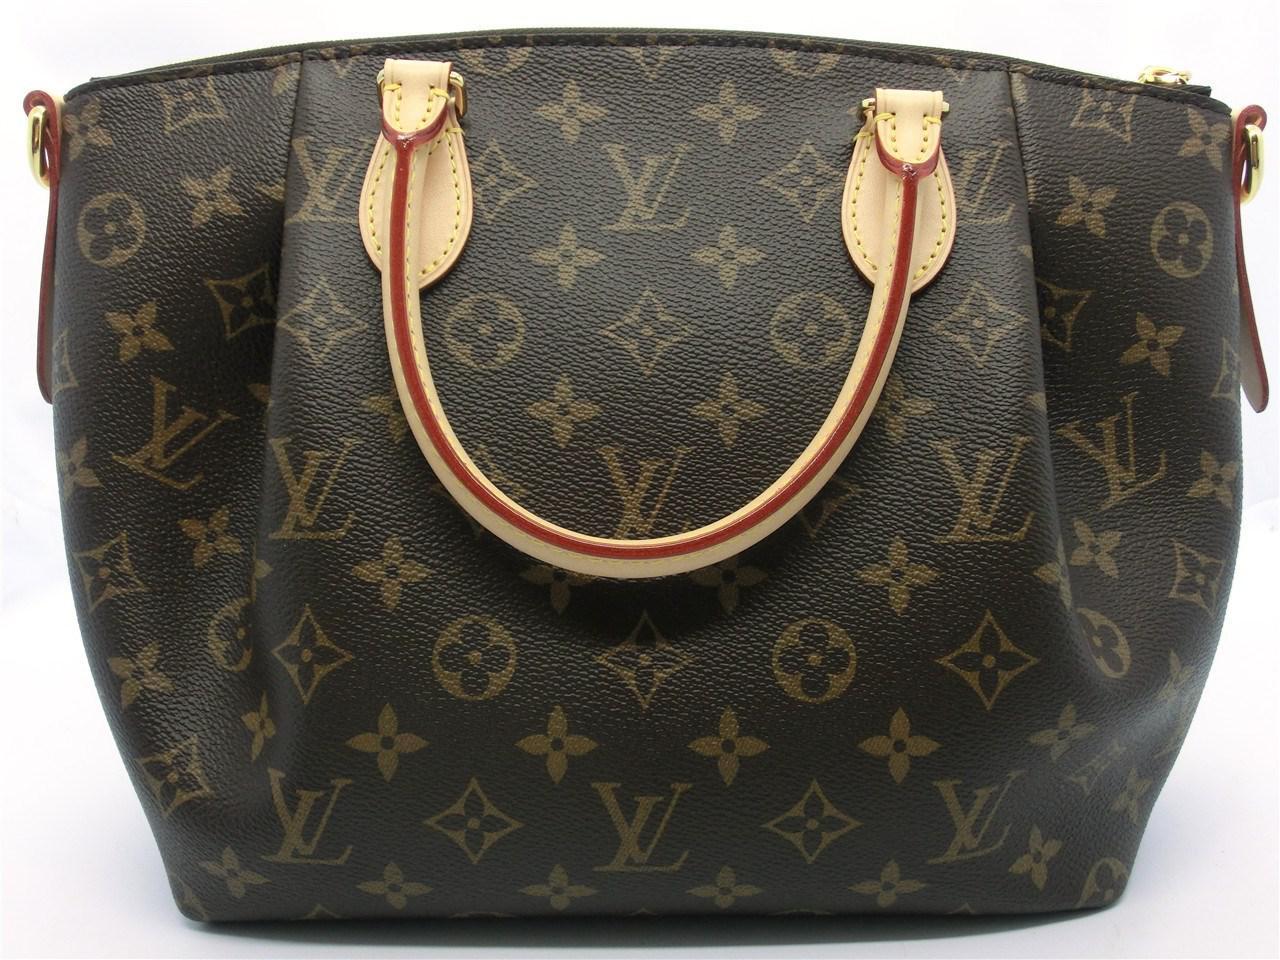 389a10c03a68 Lyst - Louis Vuitton Auth Monogram Canvas Turenne Mm Shopper Tote ...